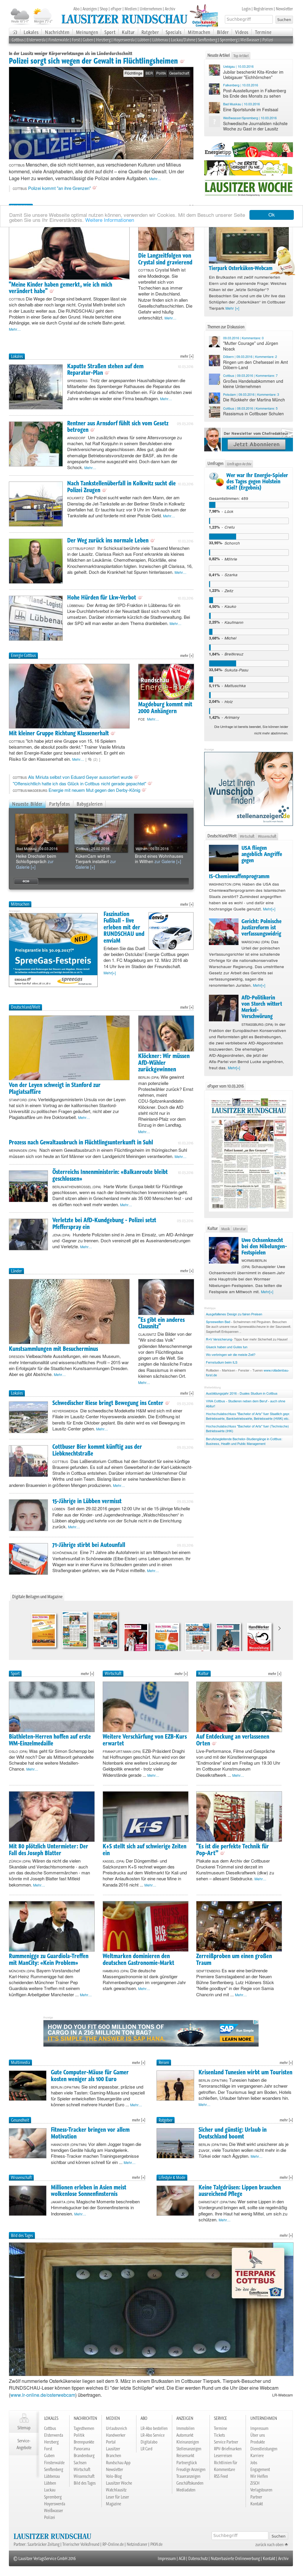 lausitz news heute